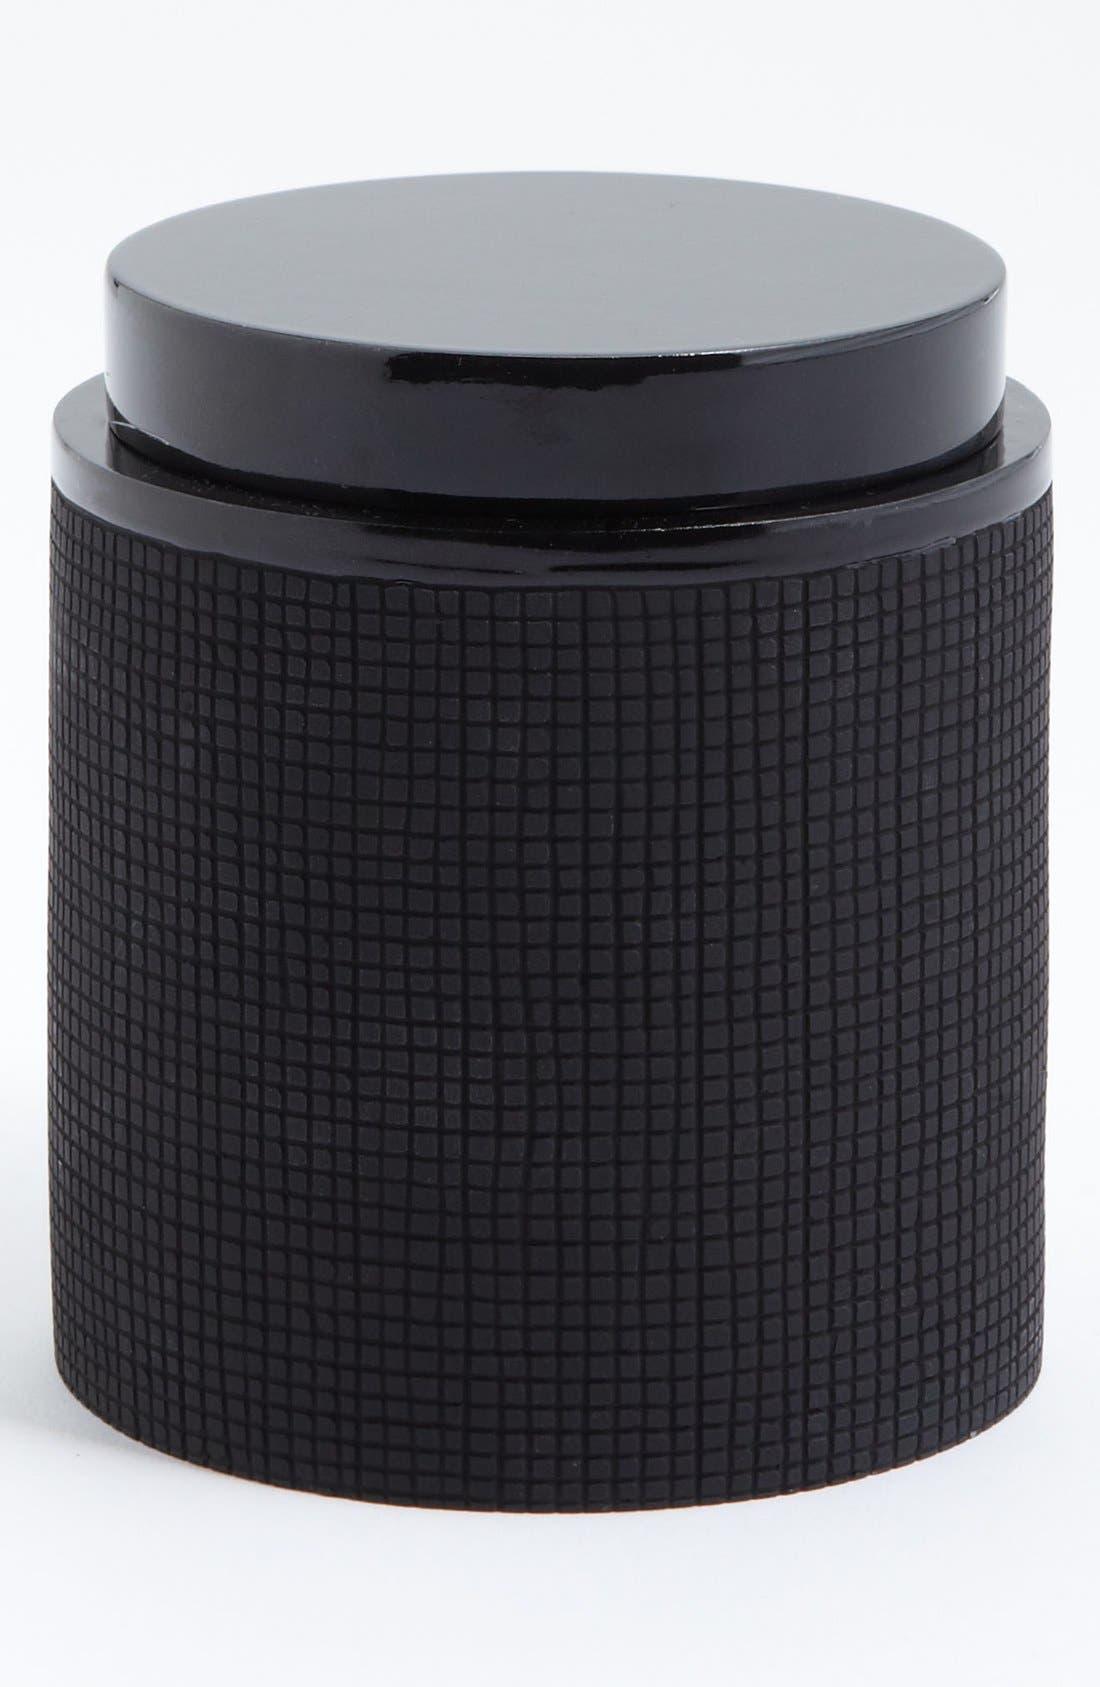 Alternate Image 1 Selected - Waterworks Studio 'Merritt' Covered Jar (Online Only)